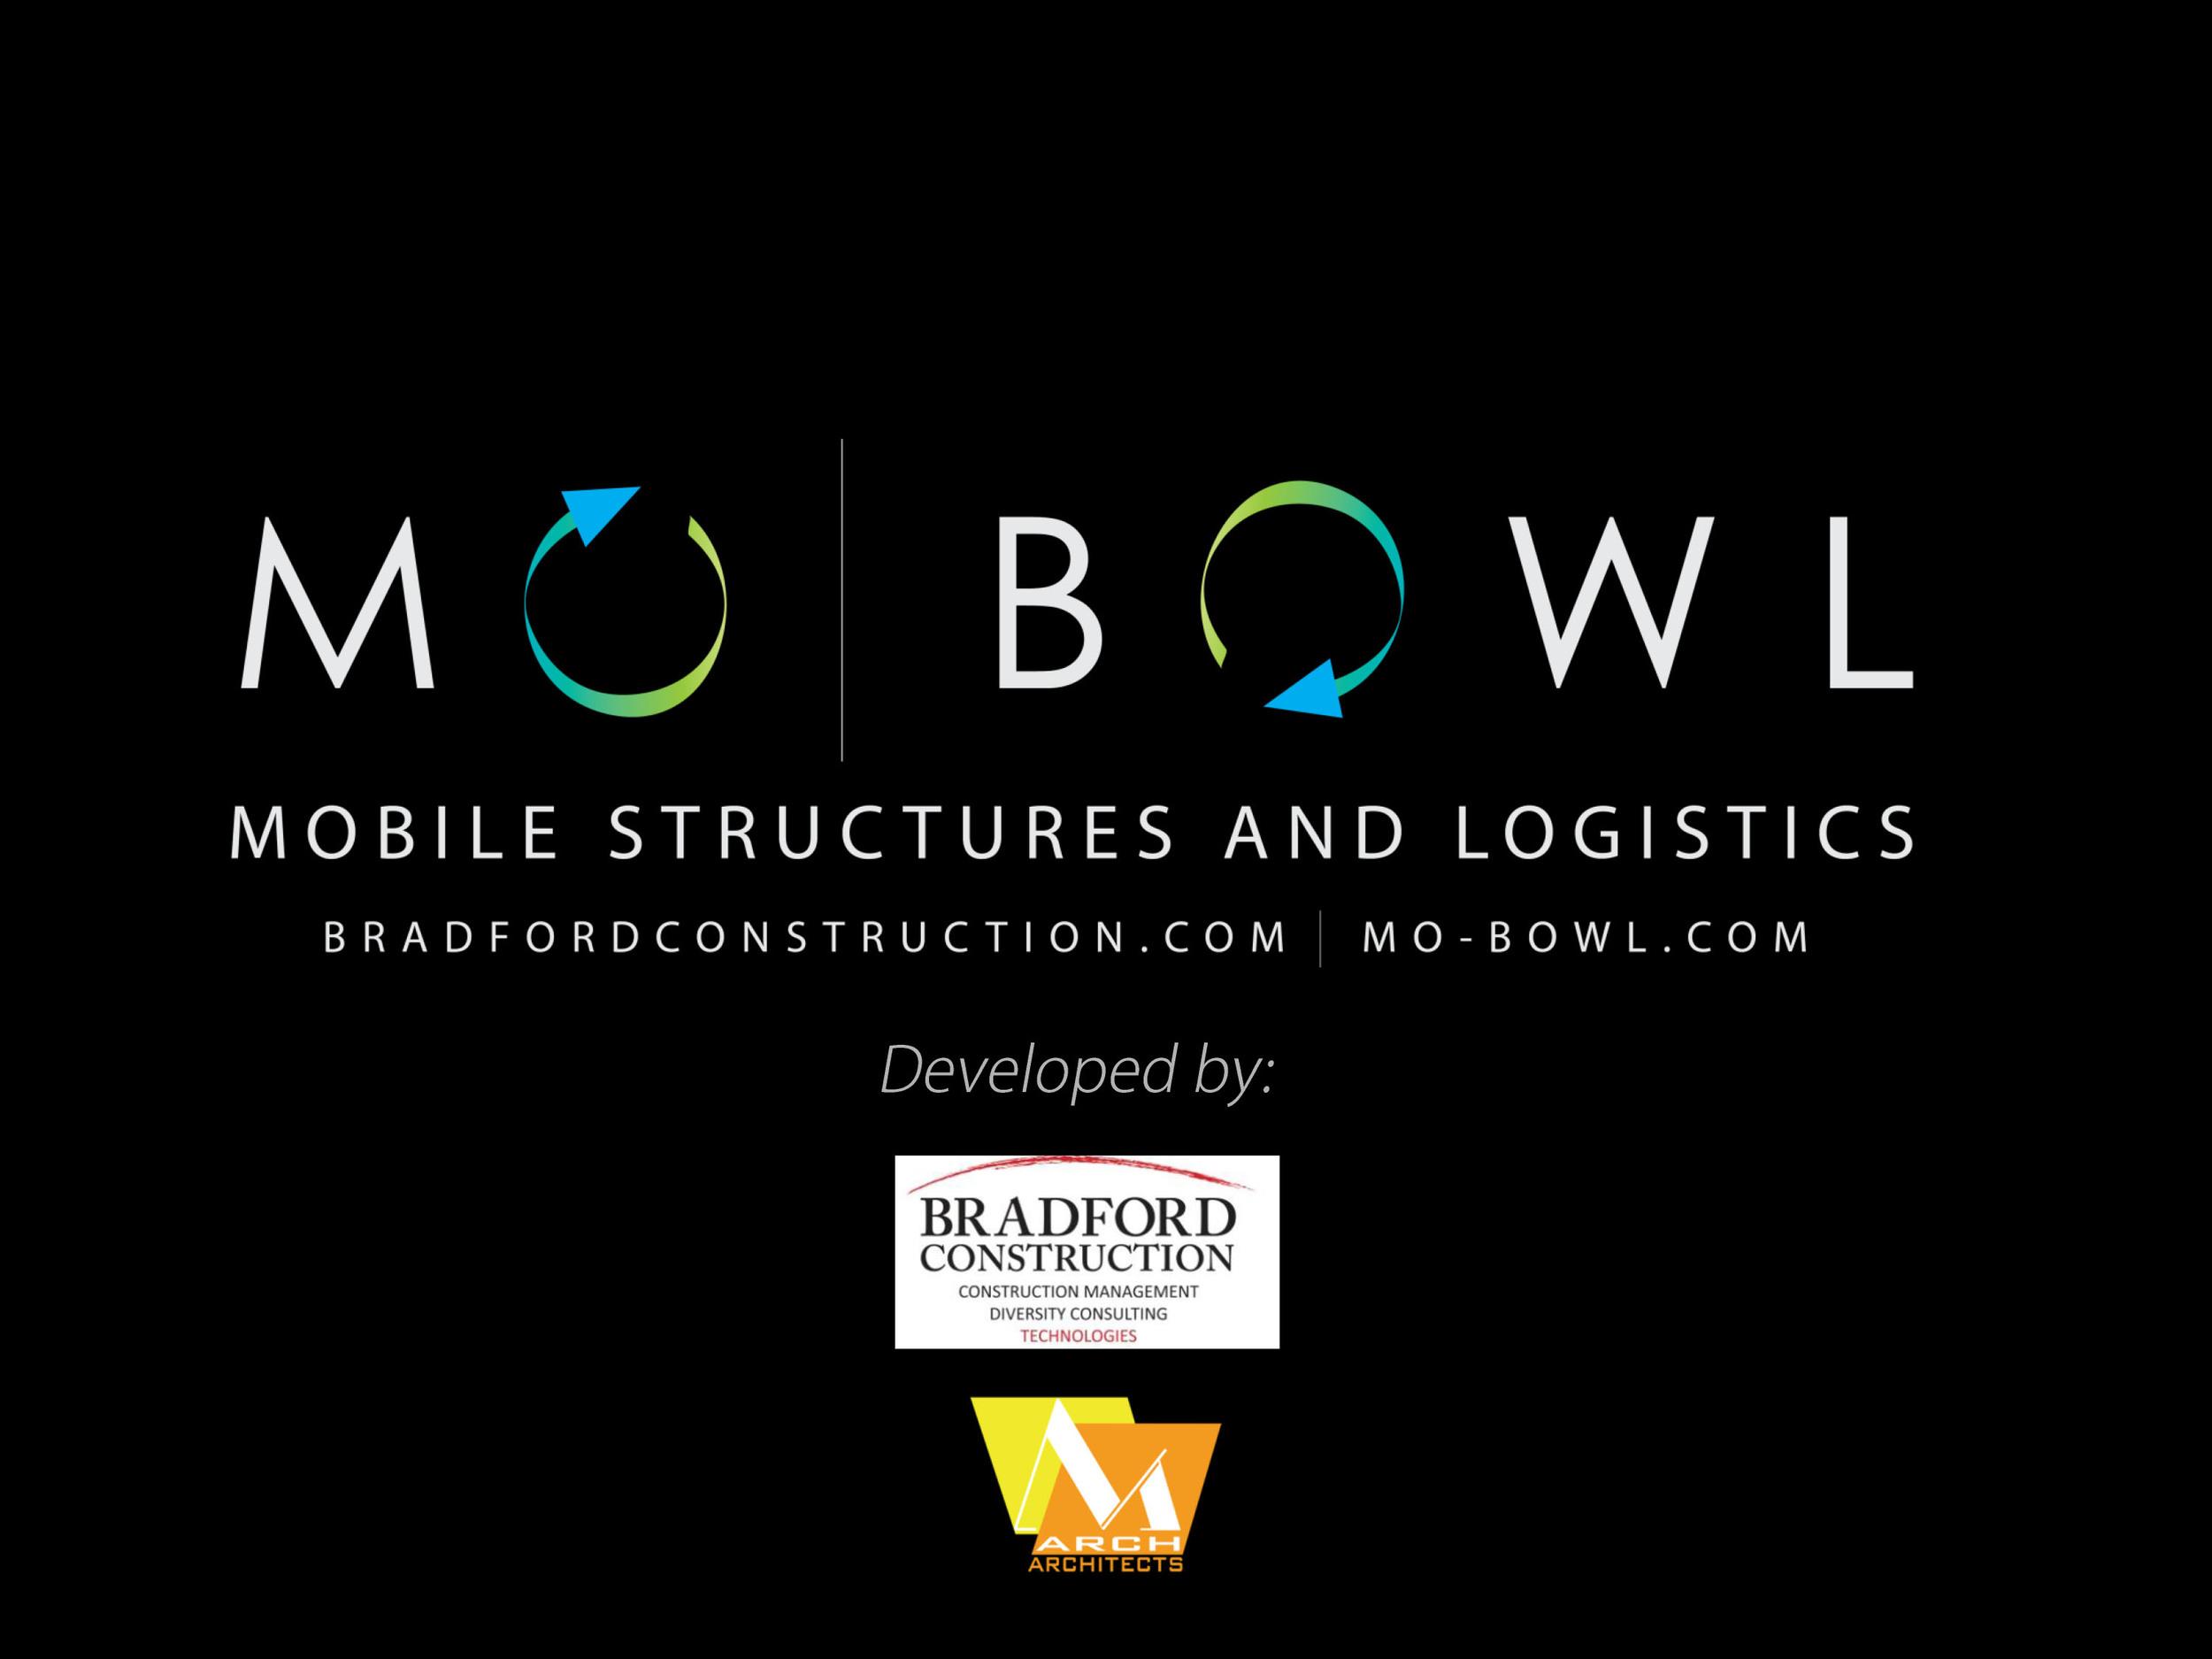 Mobowl_Presentation_final_Ver-19 copy.jpg